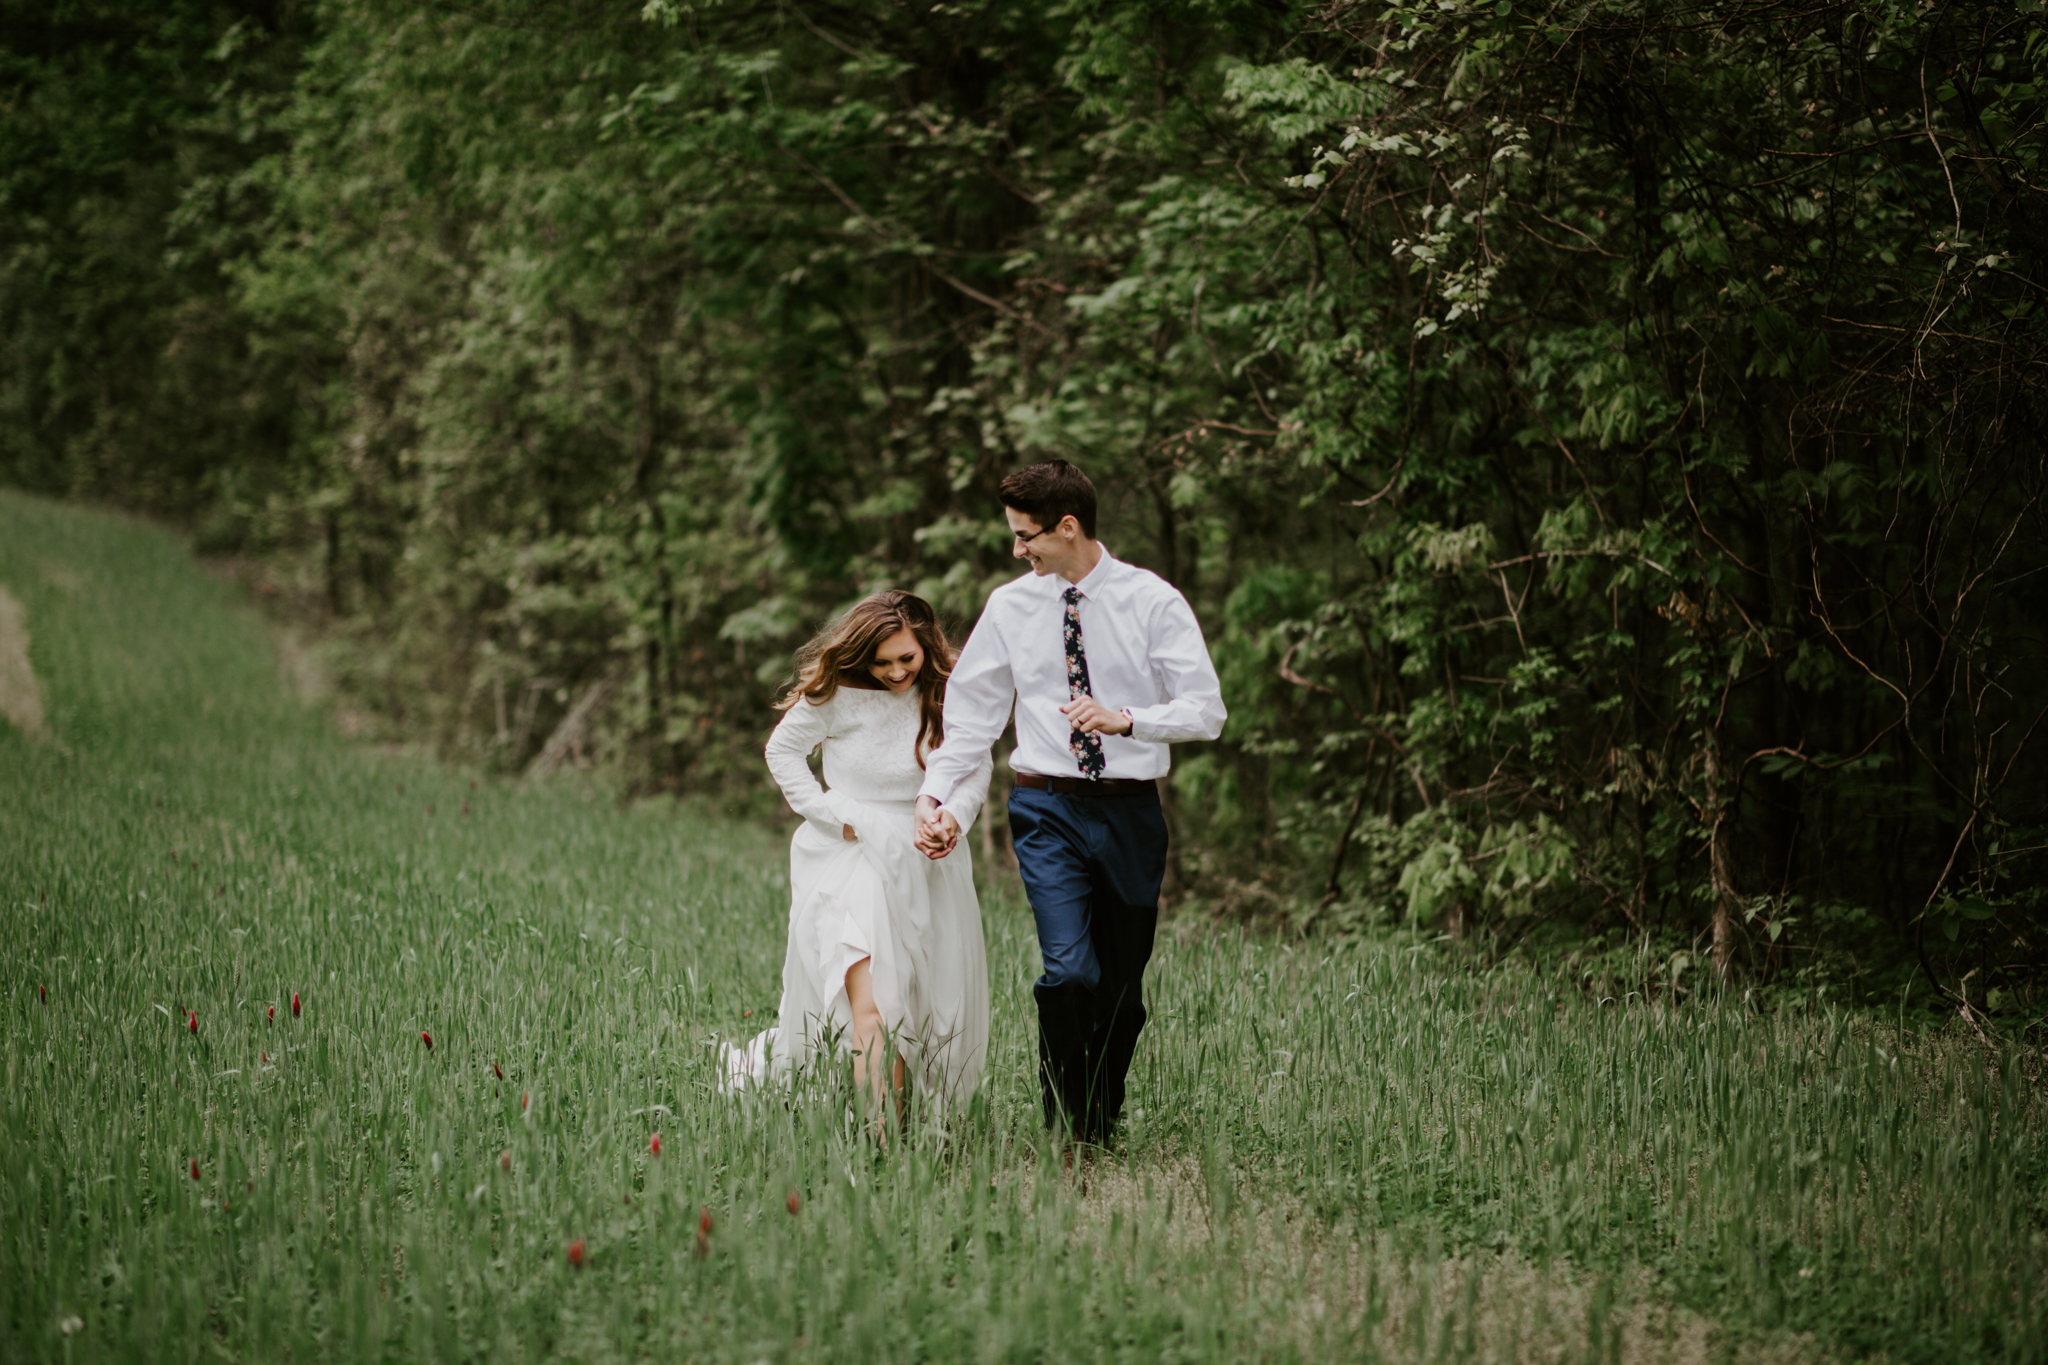 Lacey-Joe-Chattanooga-Nashville-Tennessee-Wedding-Elopement-Photographer-166.jpg